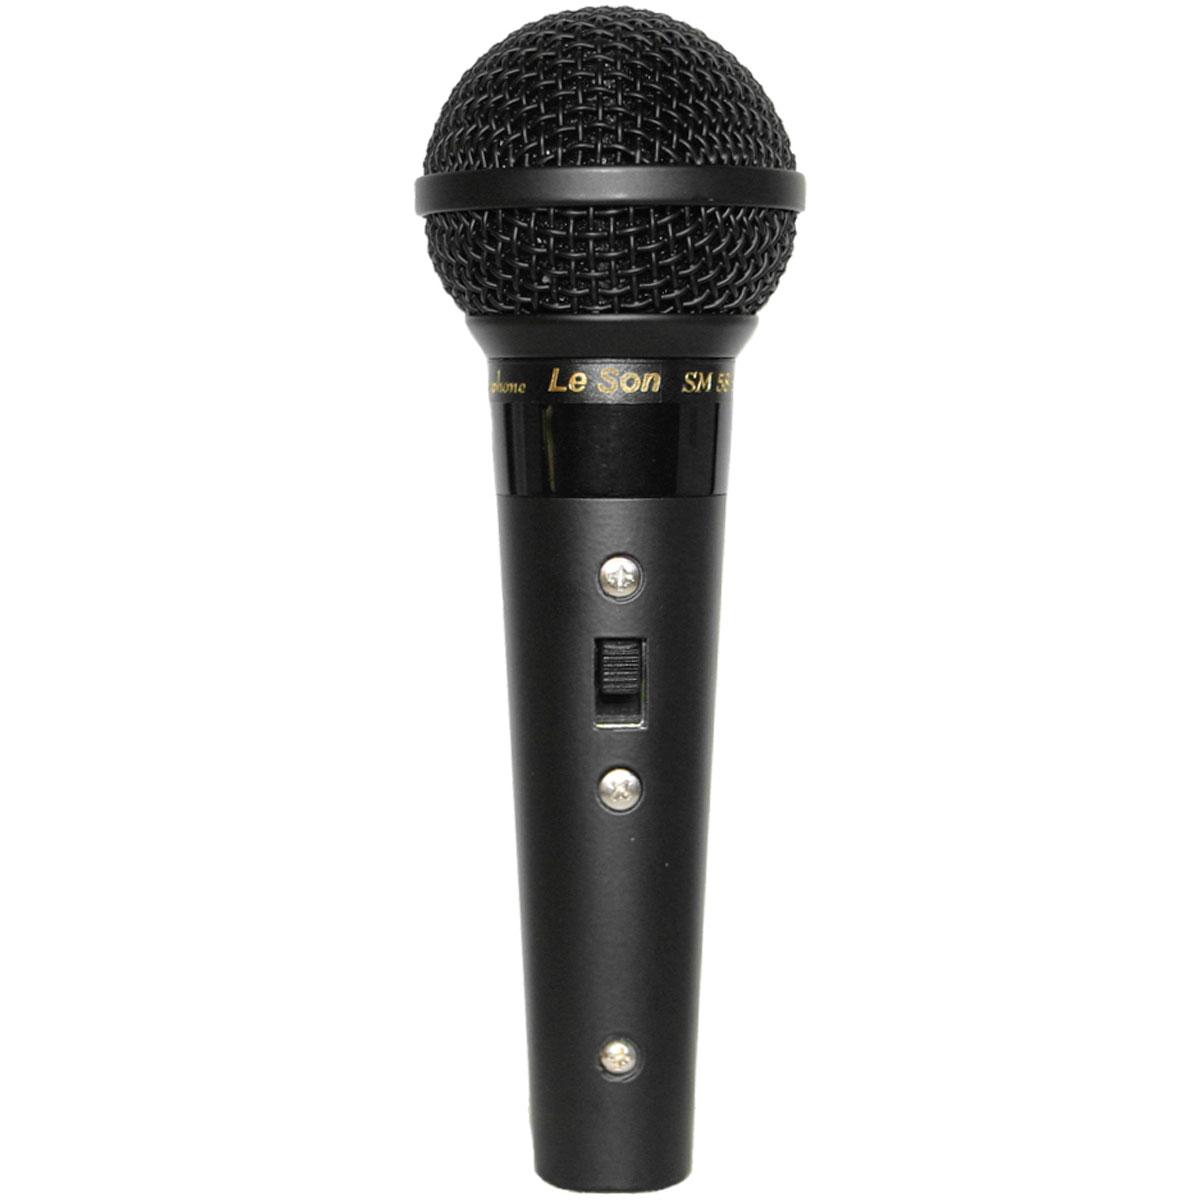 Microfone c/ Fio de Mão - SM 58 B Le Son